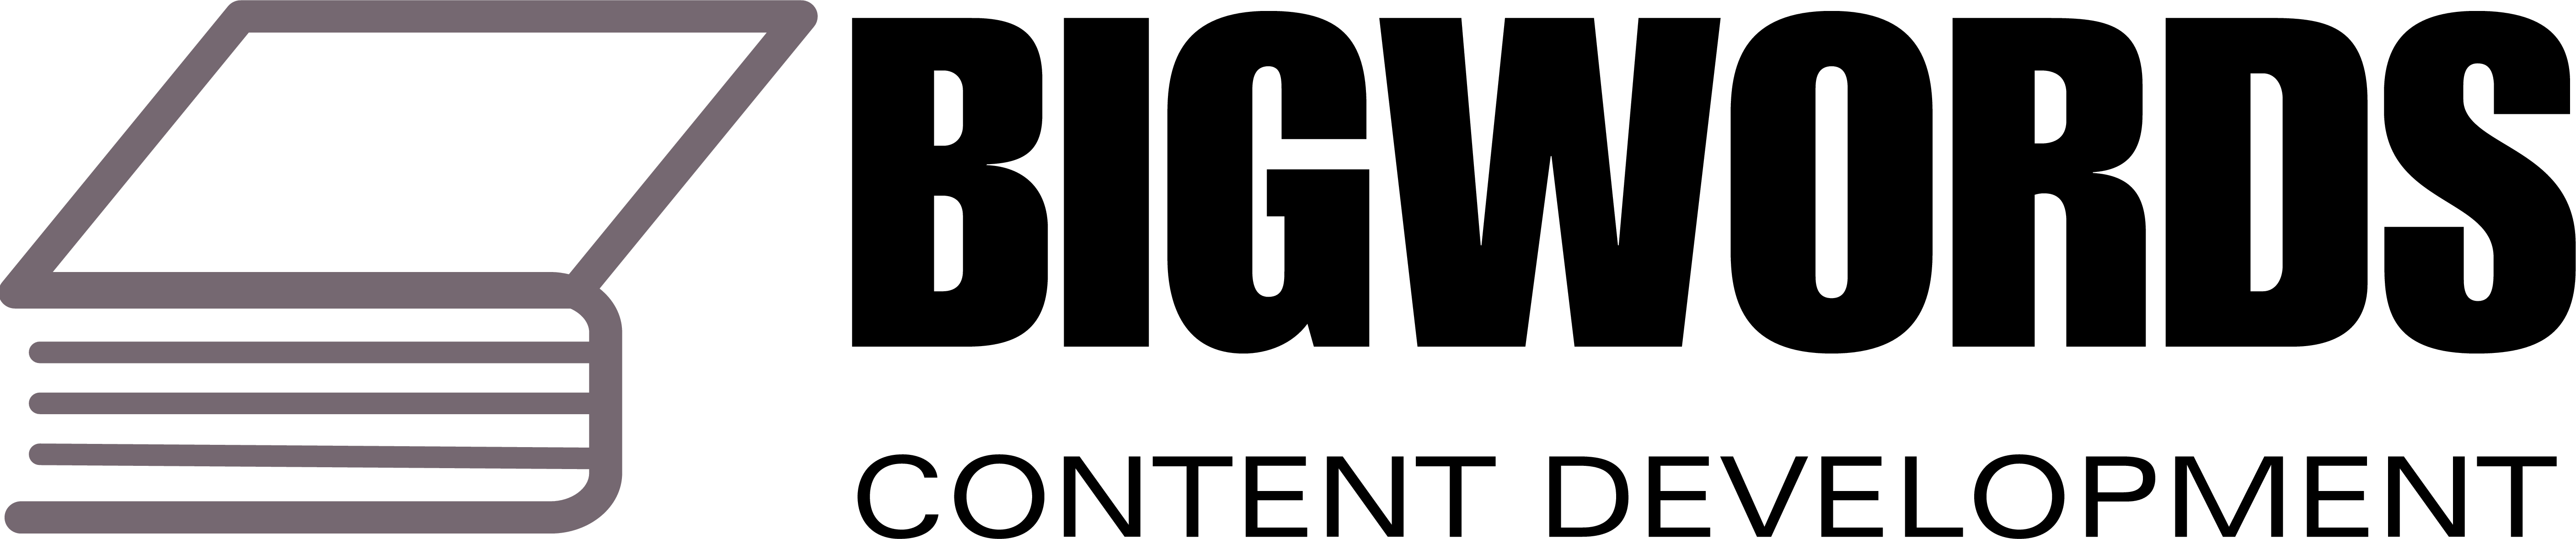 BIGWORDS Content Development